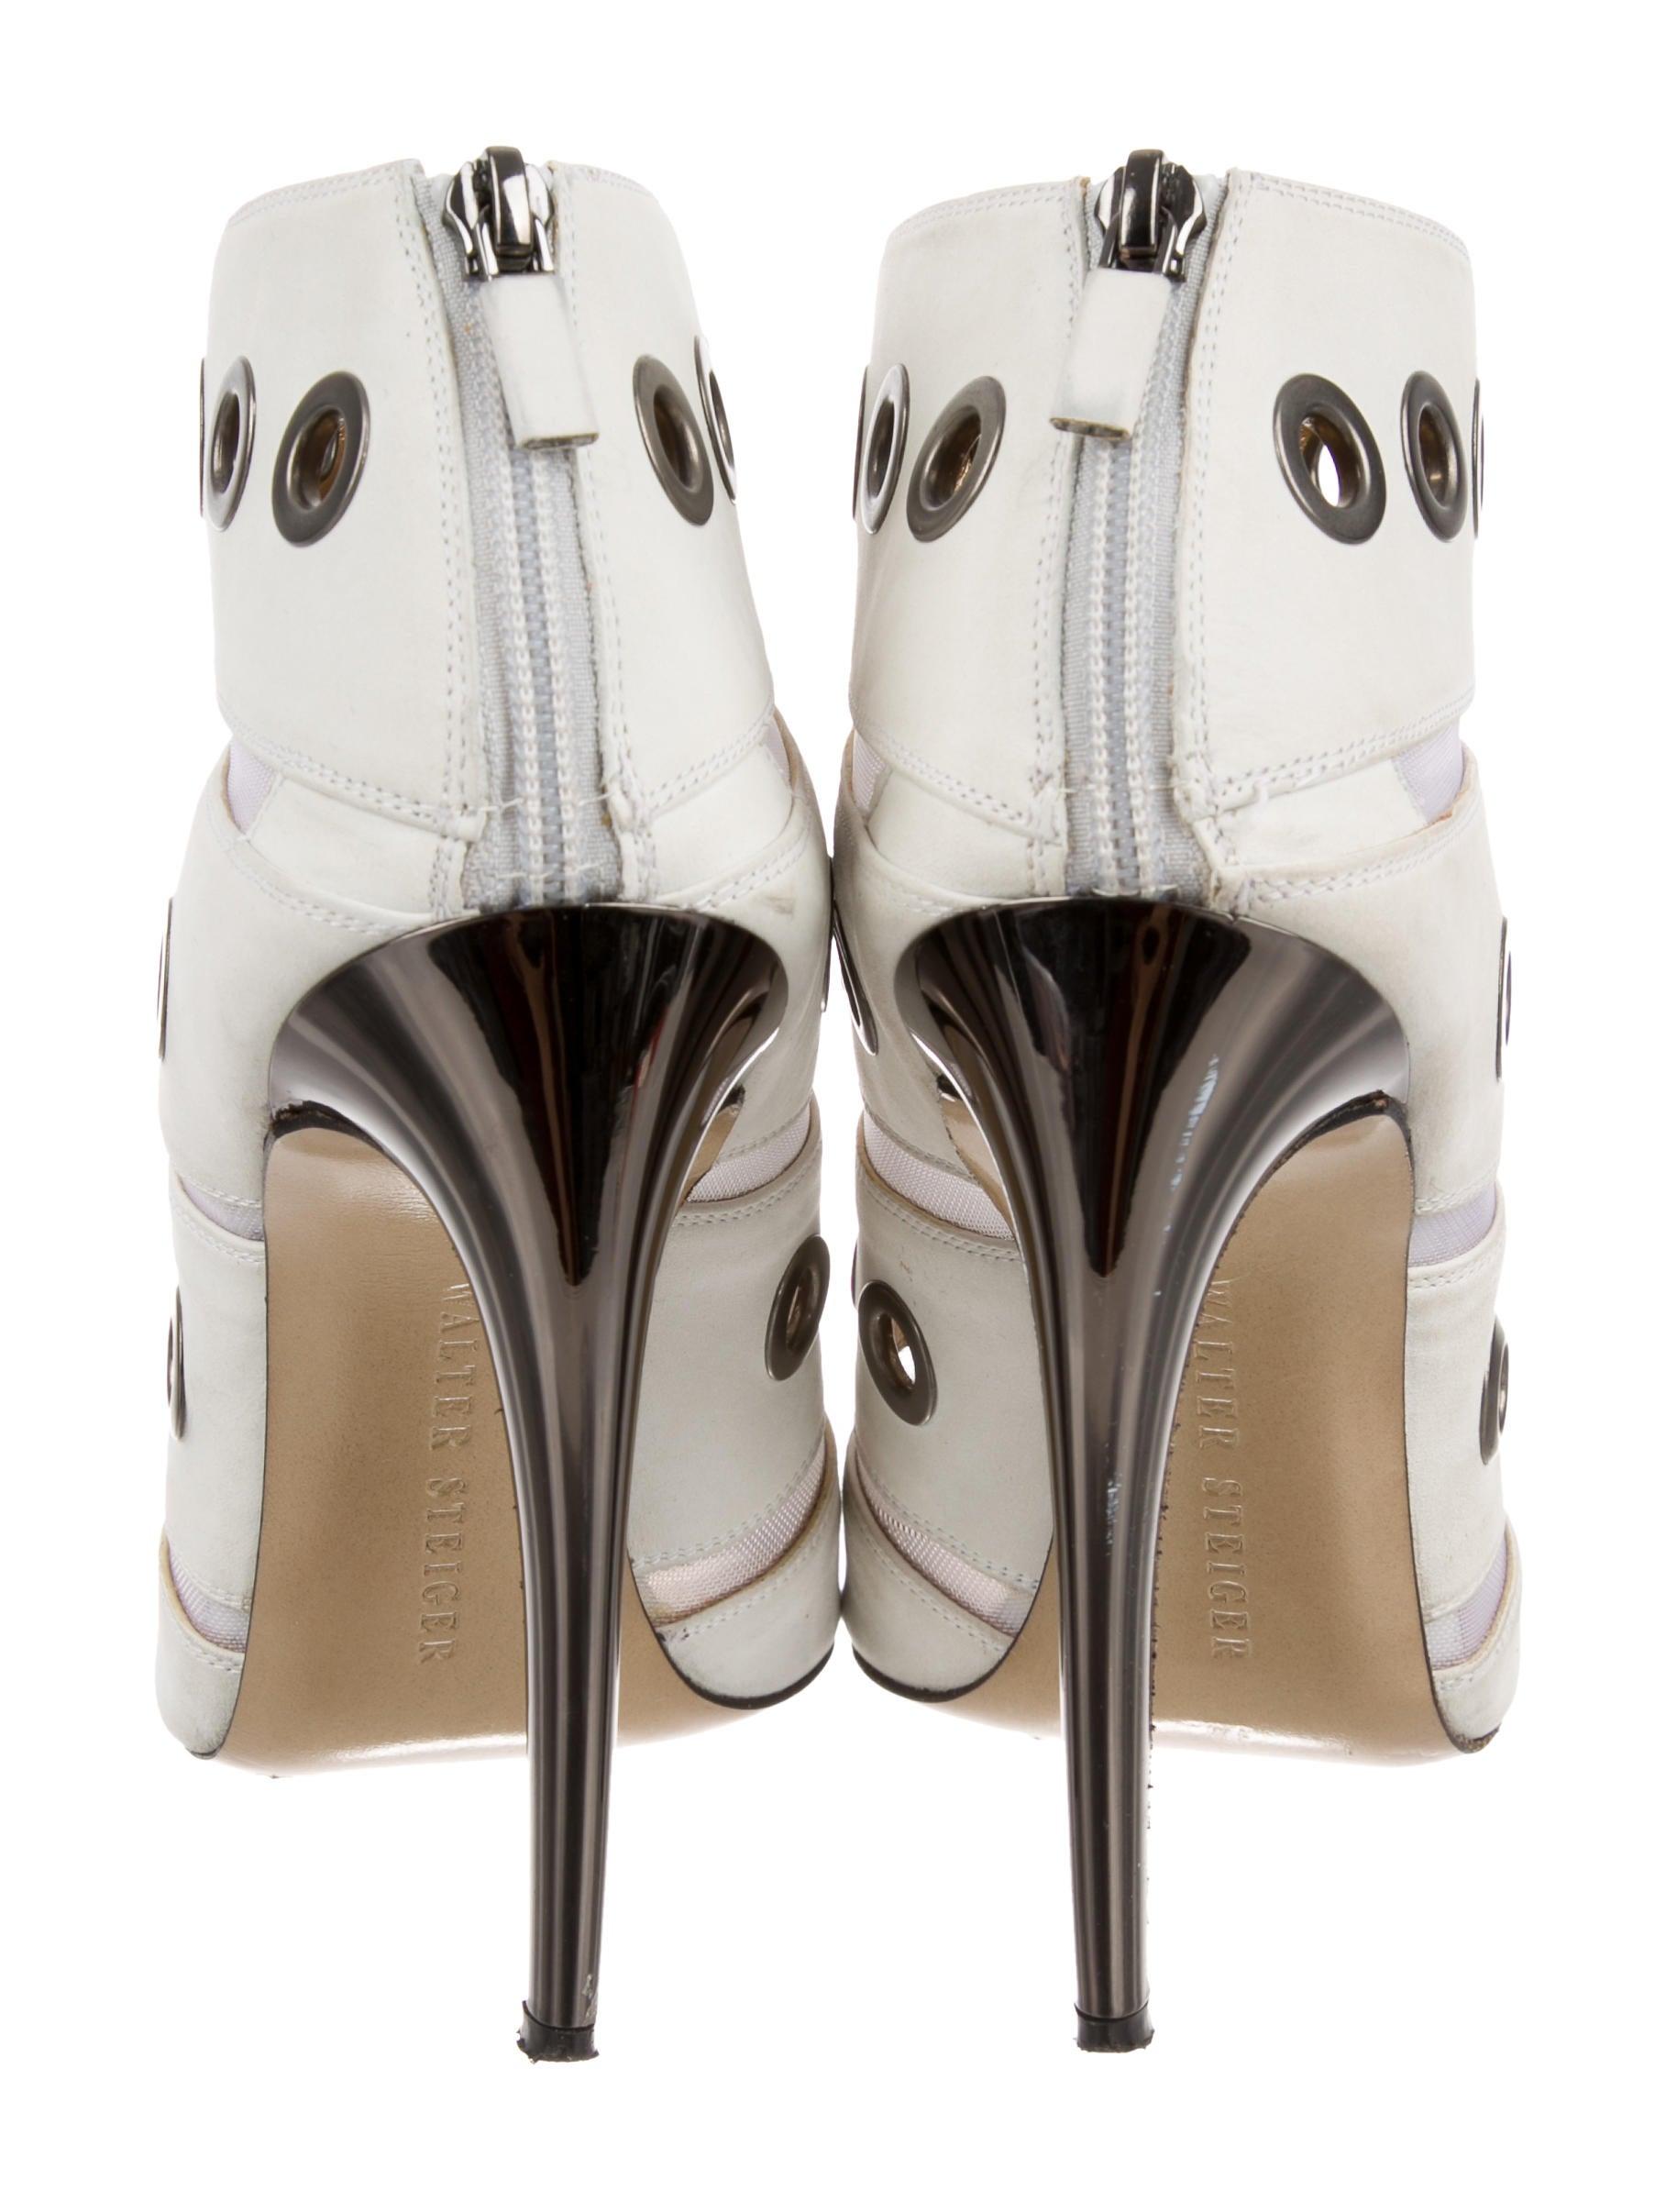 Walter Steiger Grommet-Embellished Peep-Toe Booties free shipping view gjxFteBg